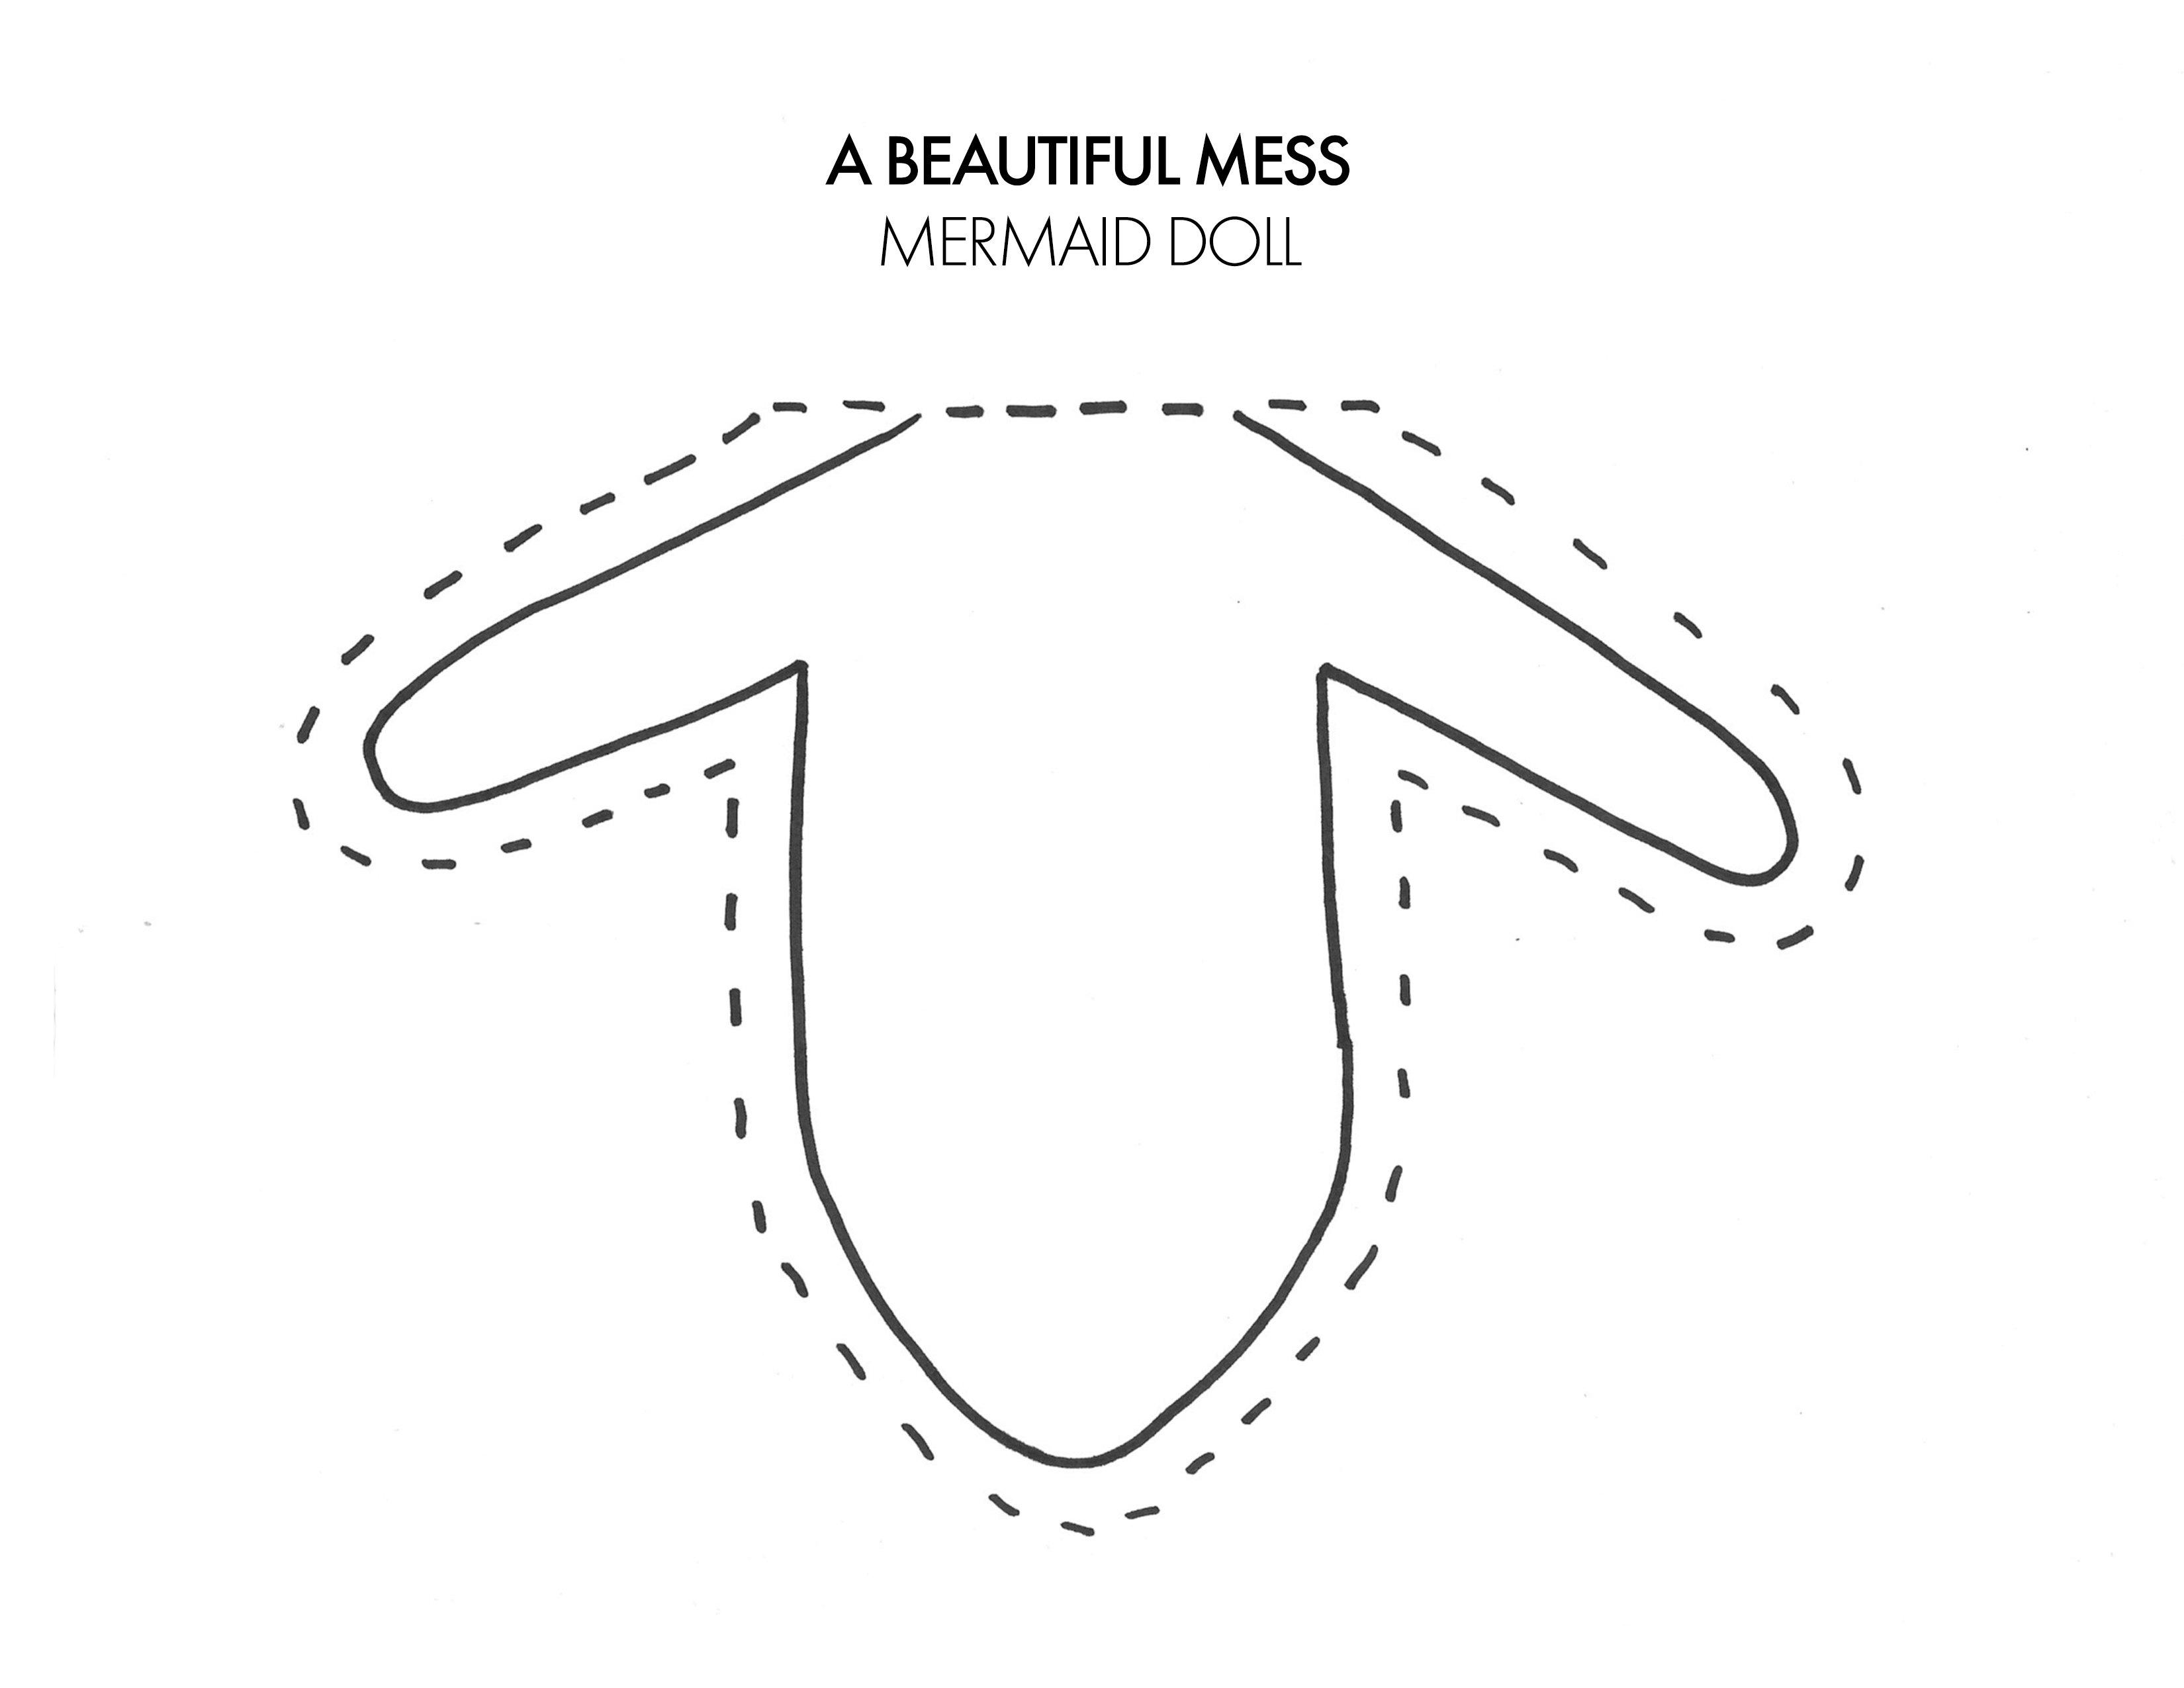 Mermaid Plush Dolls (with downloadable pattern) - A Beautiful Mess